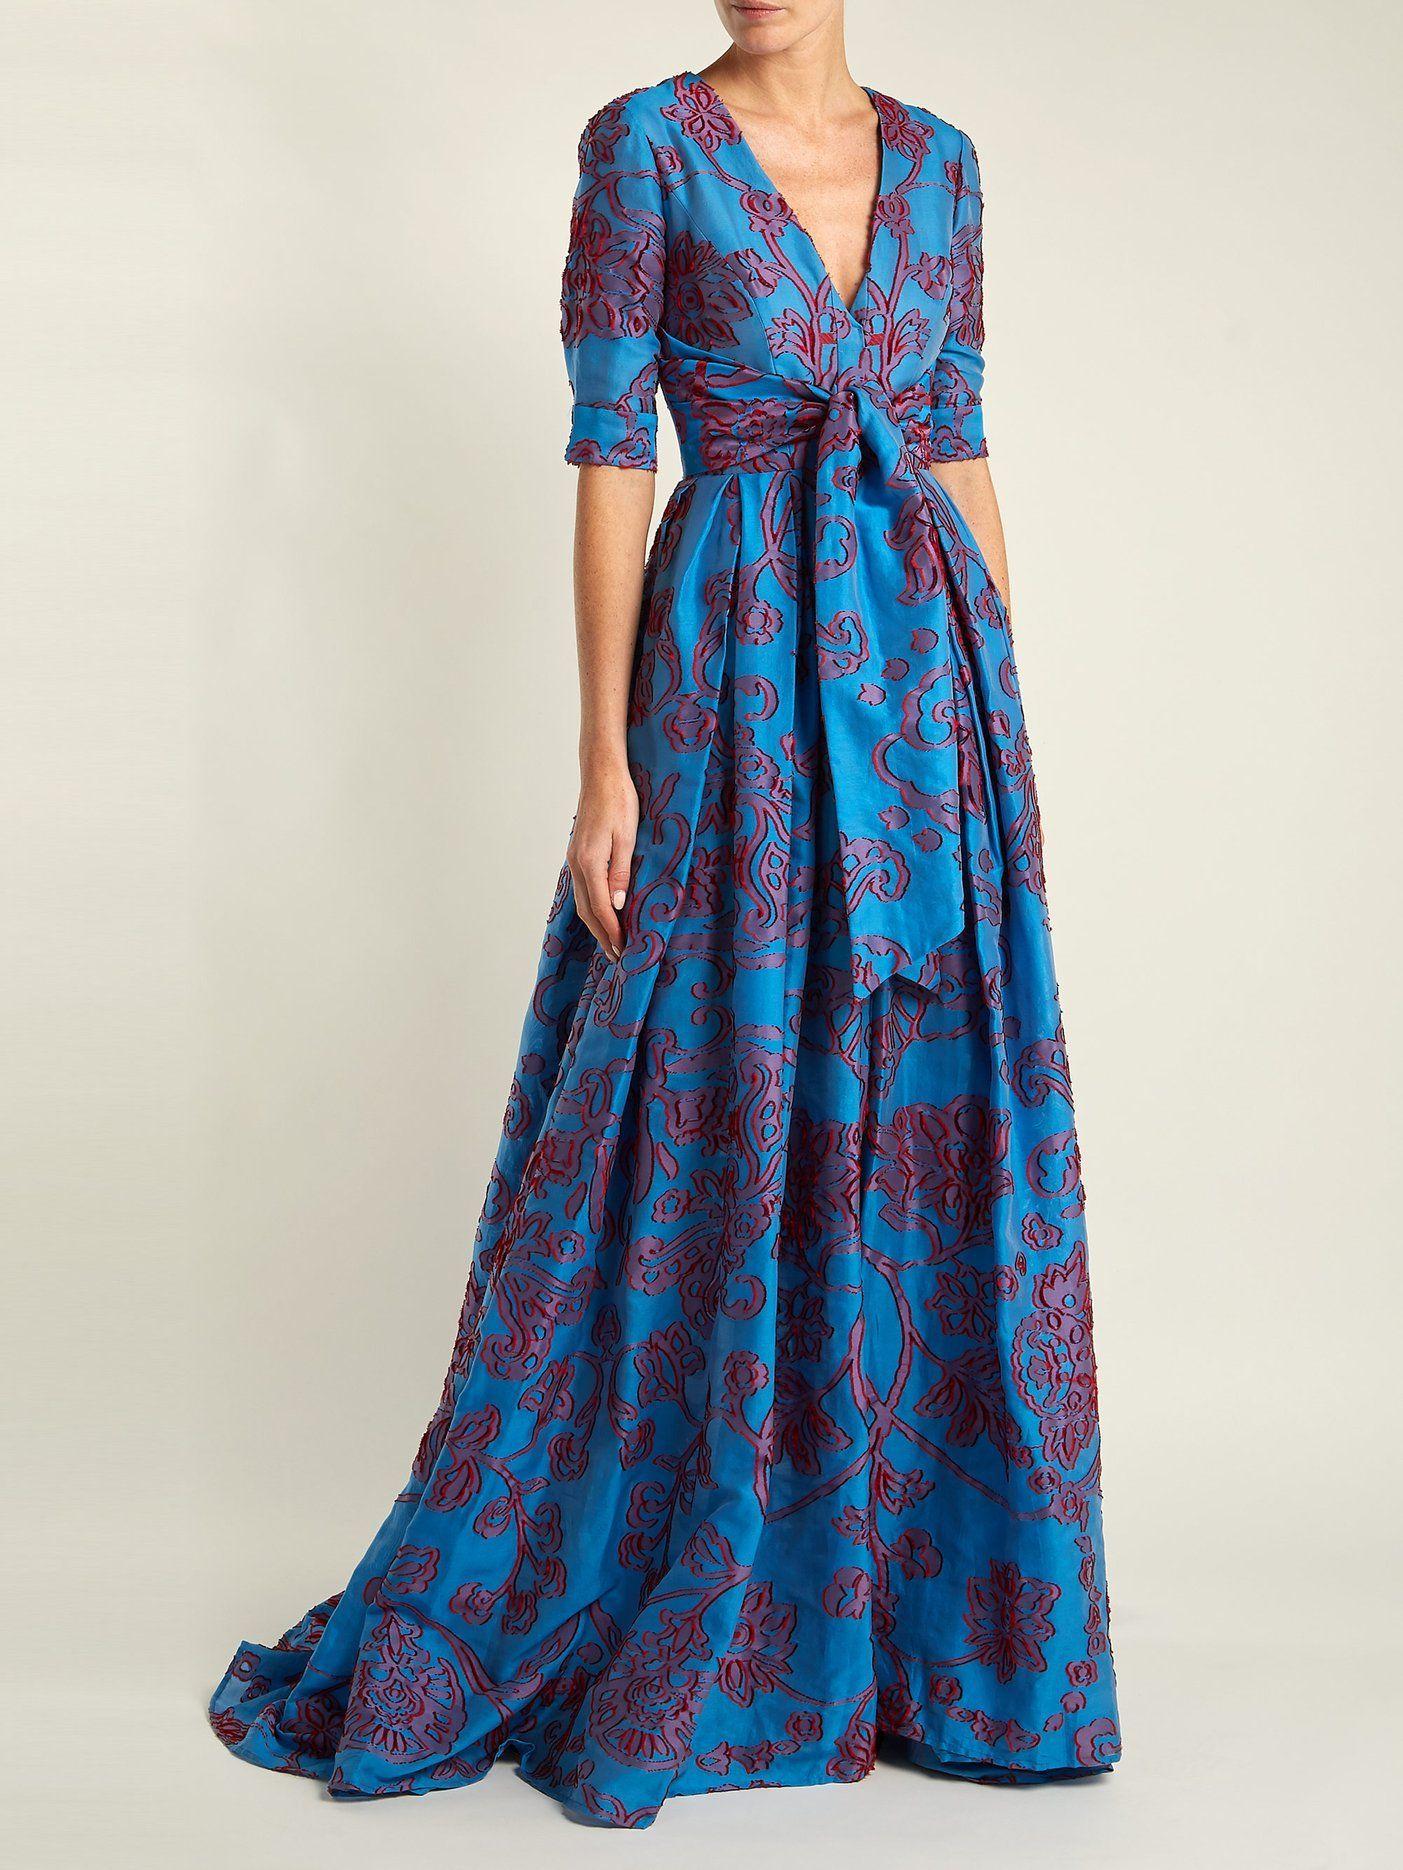 Knotted floral devoré gown  Carolina Herrera  MATCHESFASHION.COM